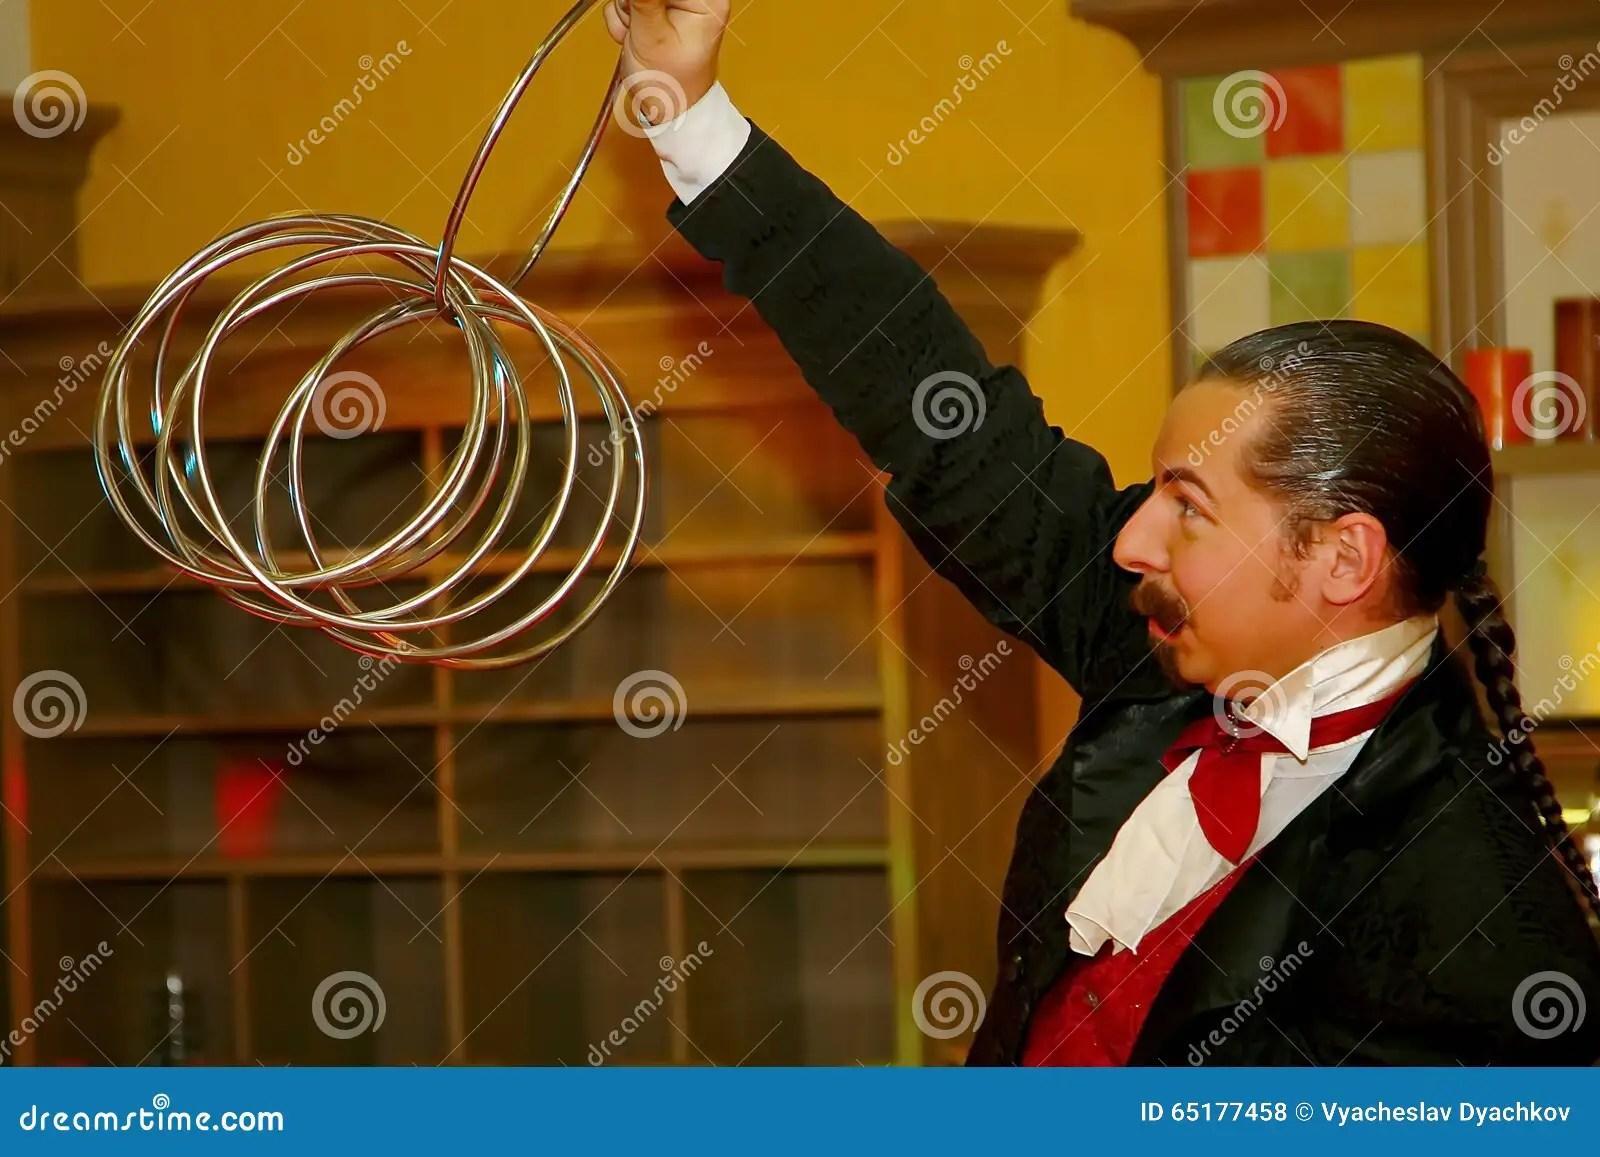 kitchen magician best stoves 使用与火 由演员的表现魔术师魔术师罗马罗宋汤编辑类库存照片 图片包括 一个美丽和轰烈的富人场面餐馆室内设计旅馆朱鹭 圣彼德堡 俄罗斯的家厨房由魔术师的表现罗马罗宋汤